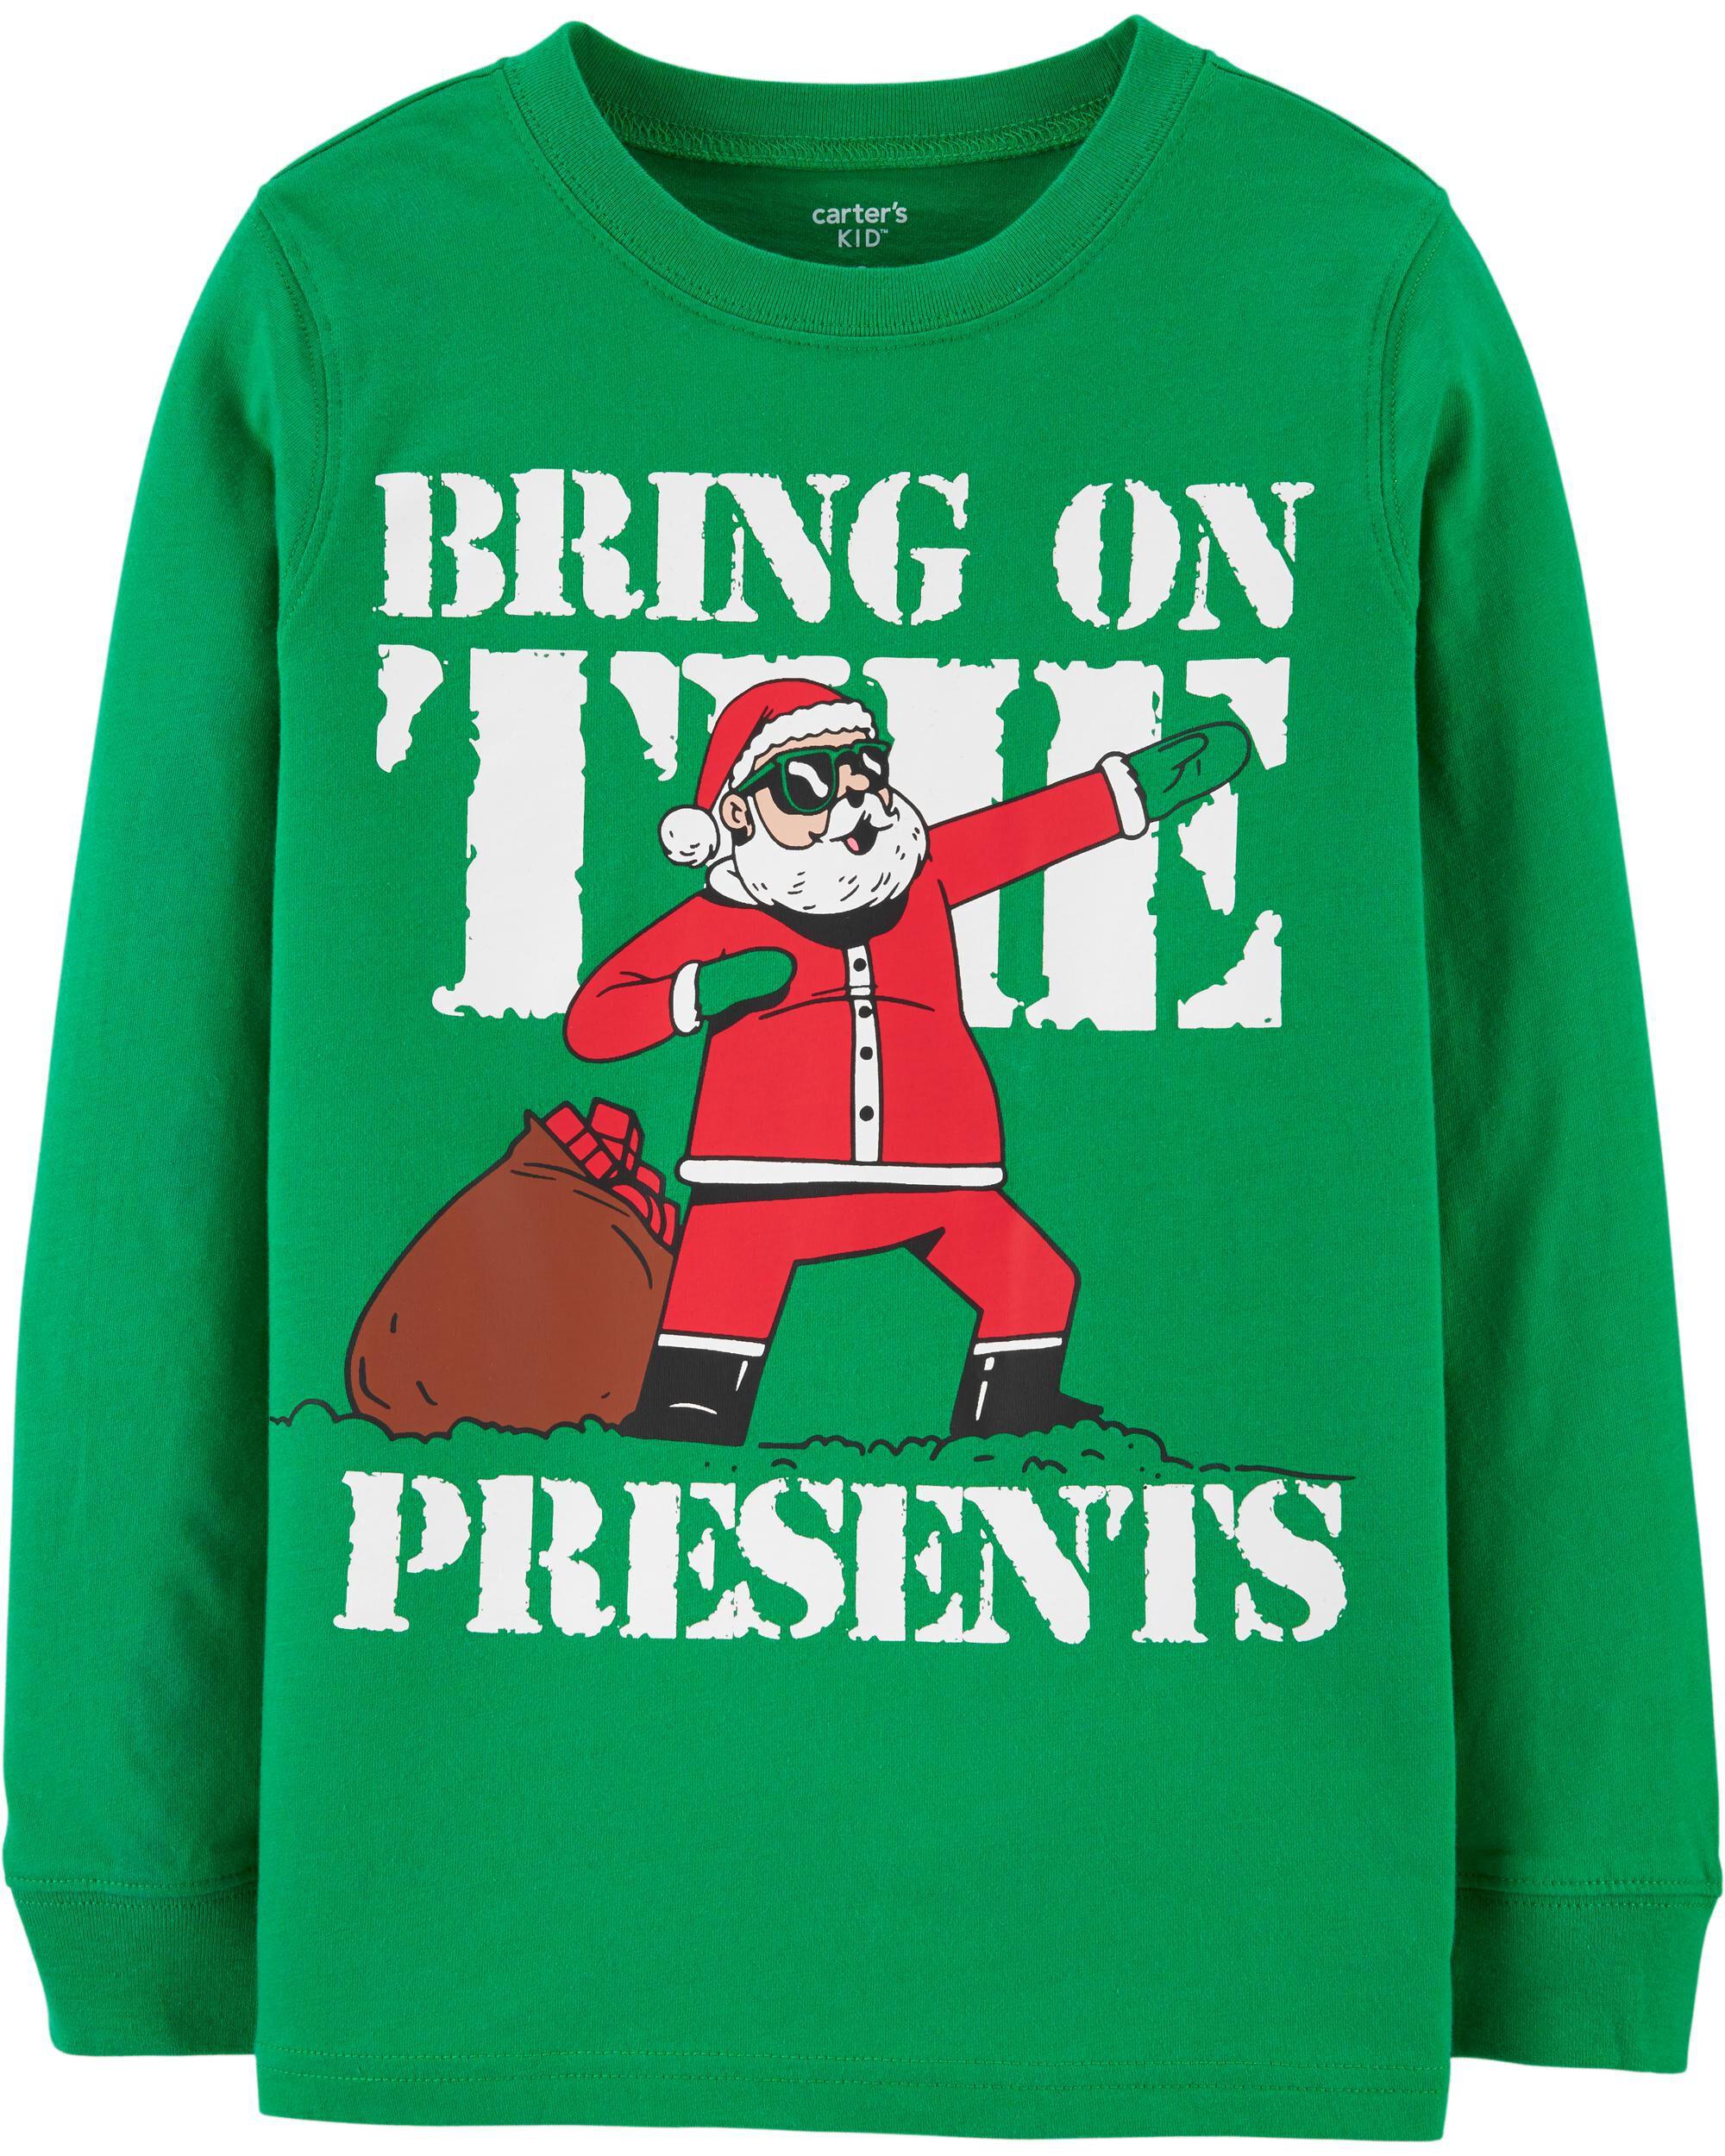 *DOORBUSTER* Bring On The Presents Santa Jersey Tee